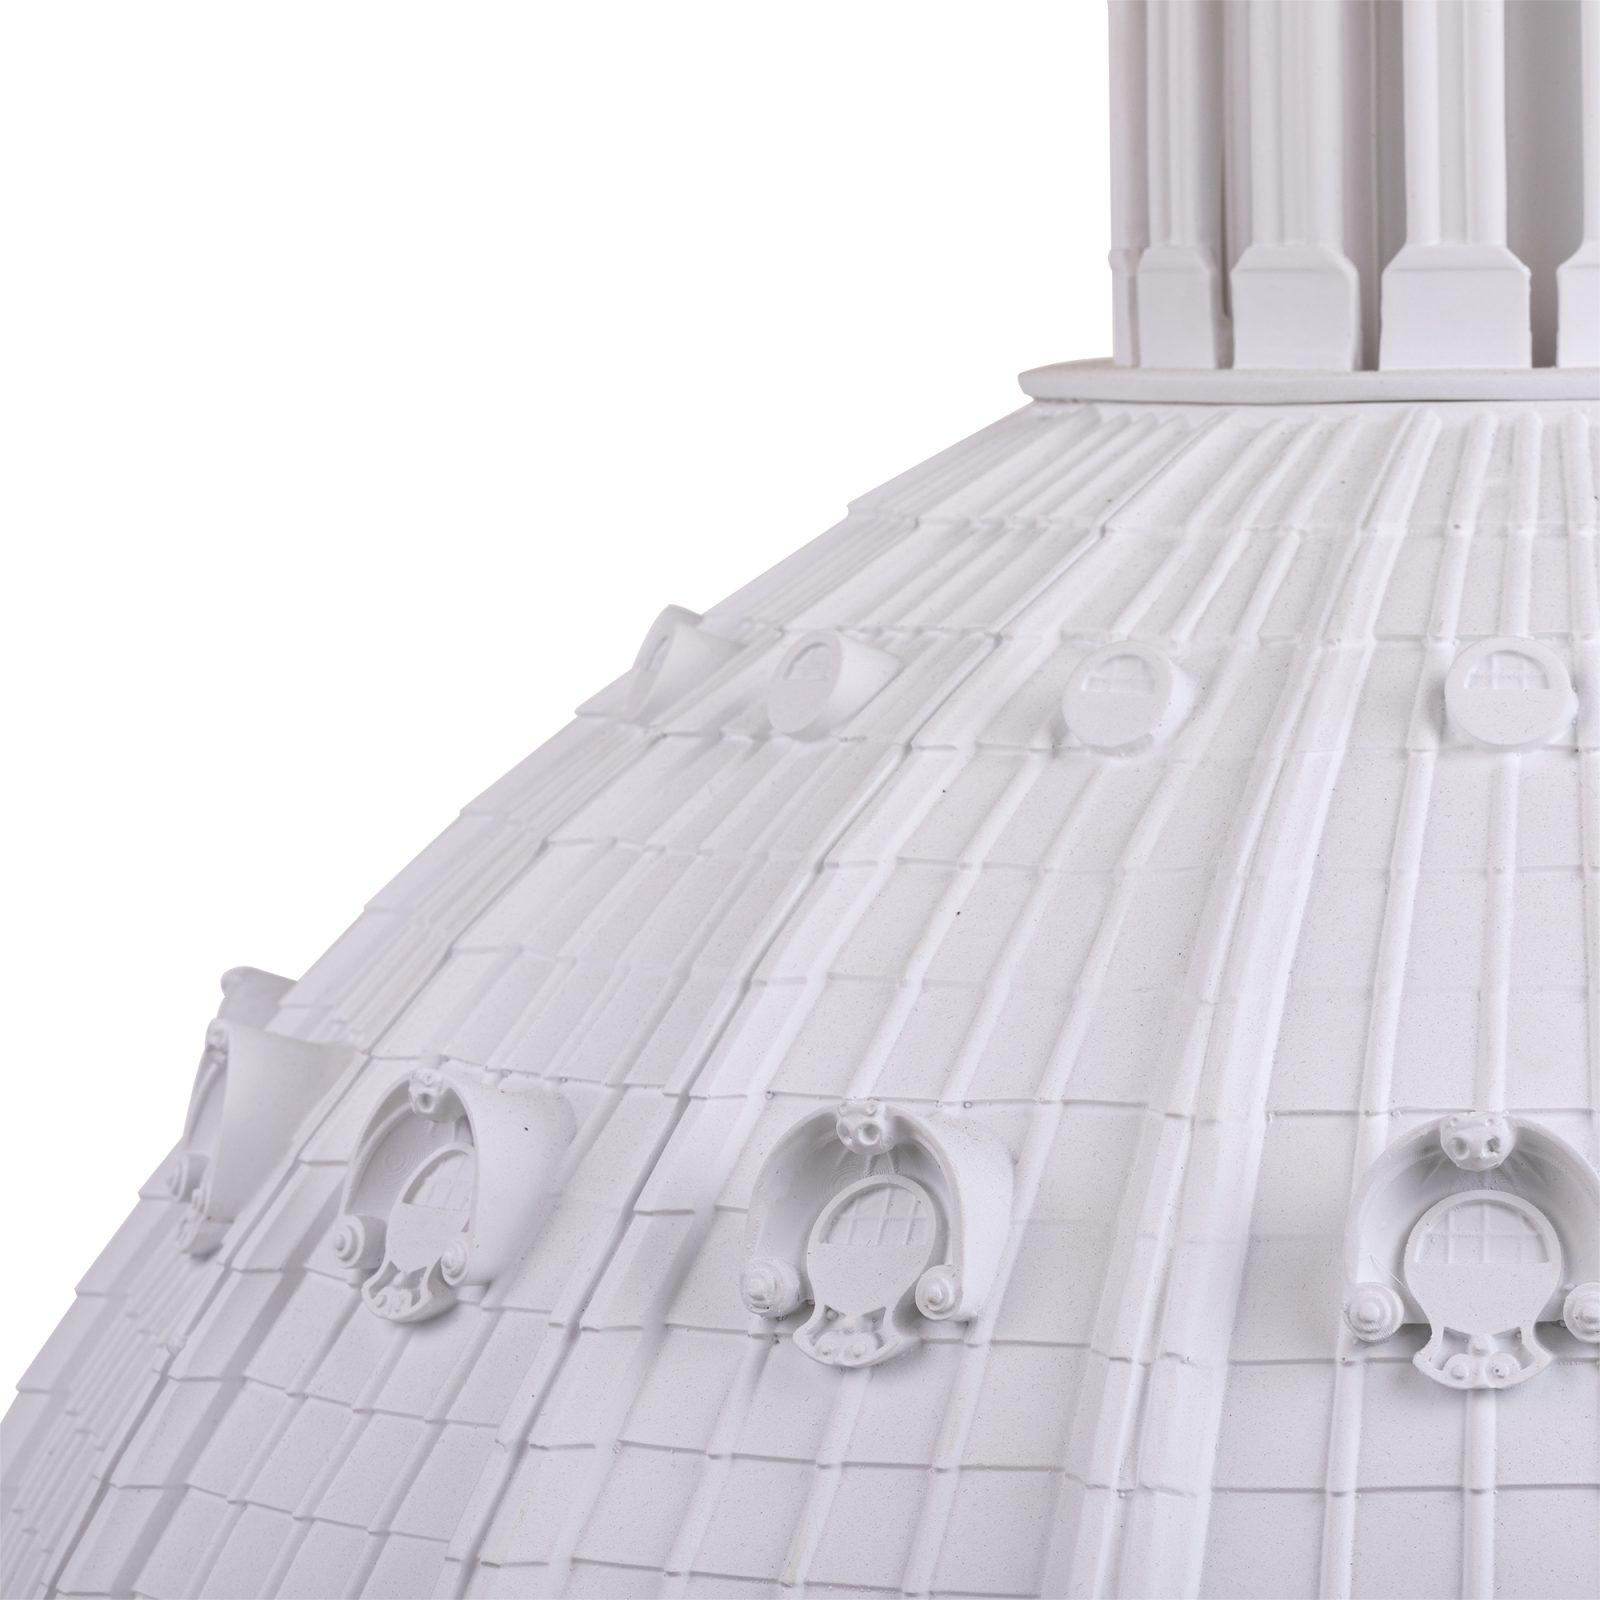 seletti-cupolone-lamp-white-5